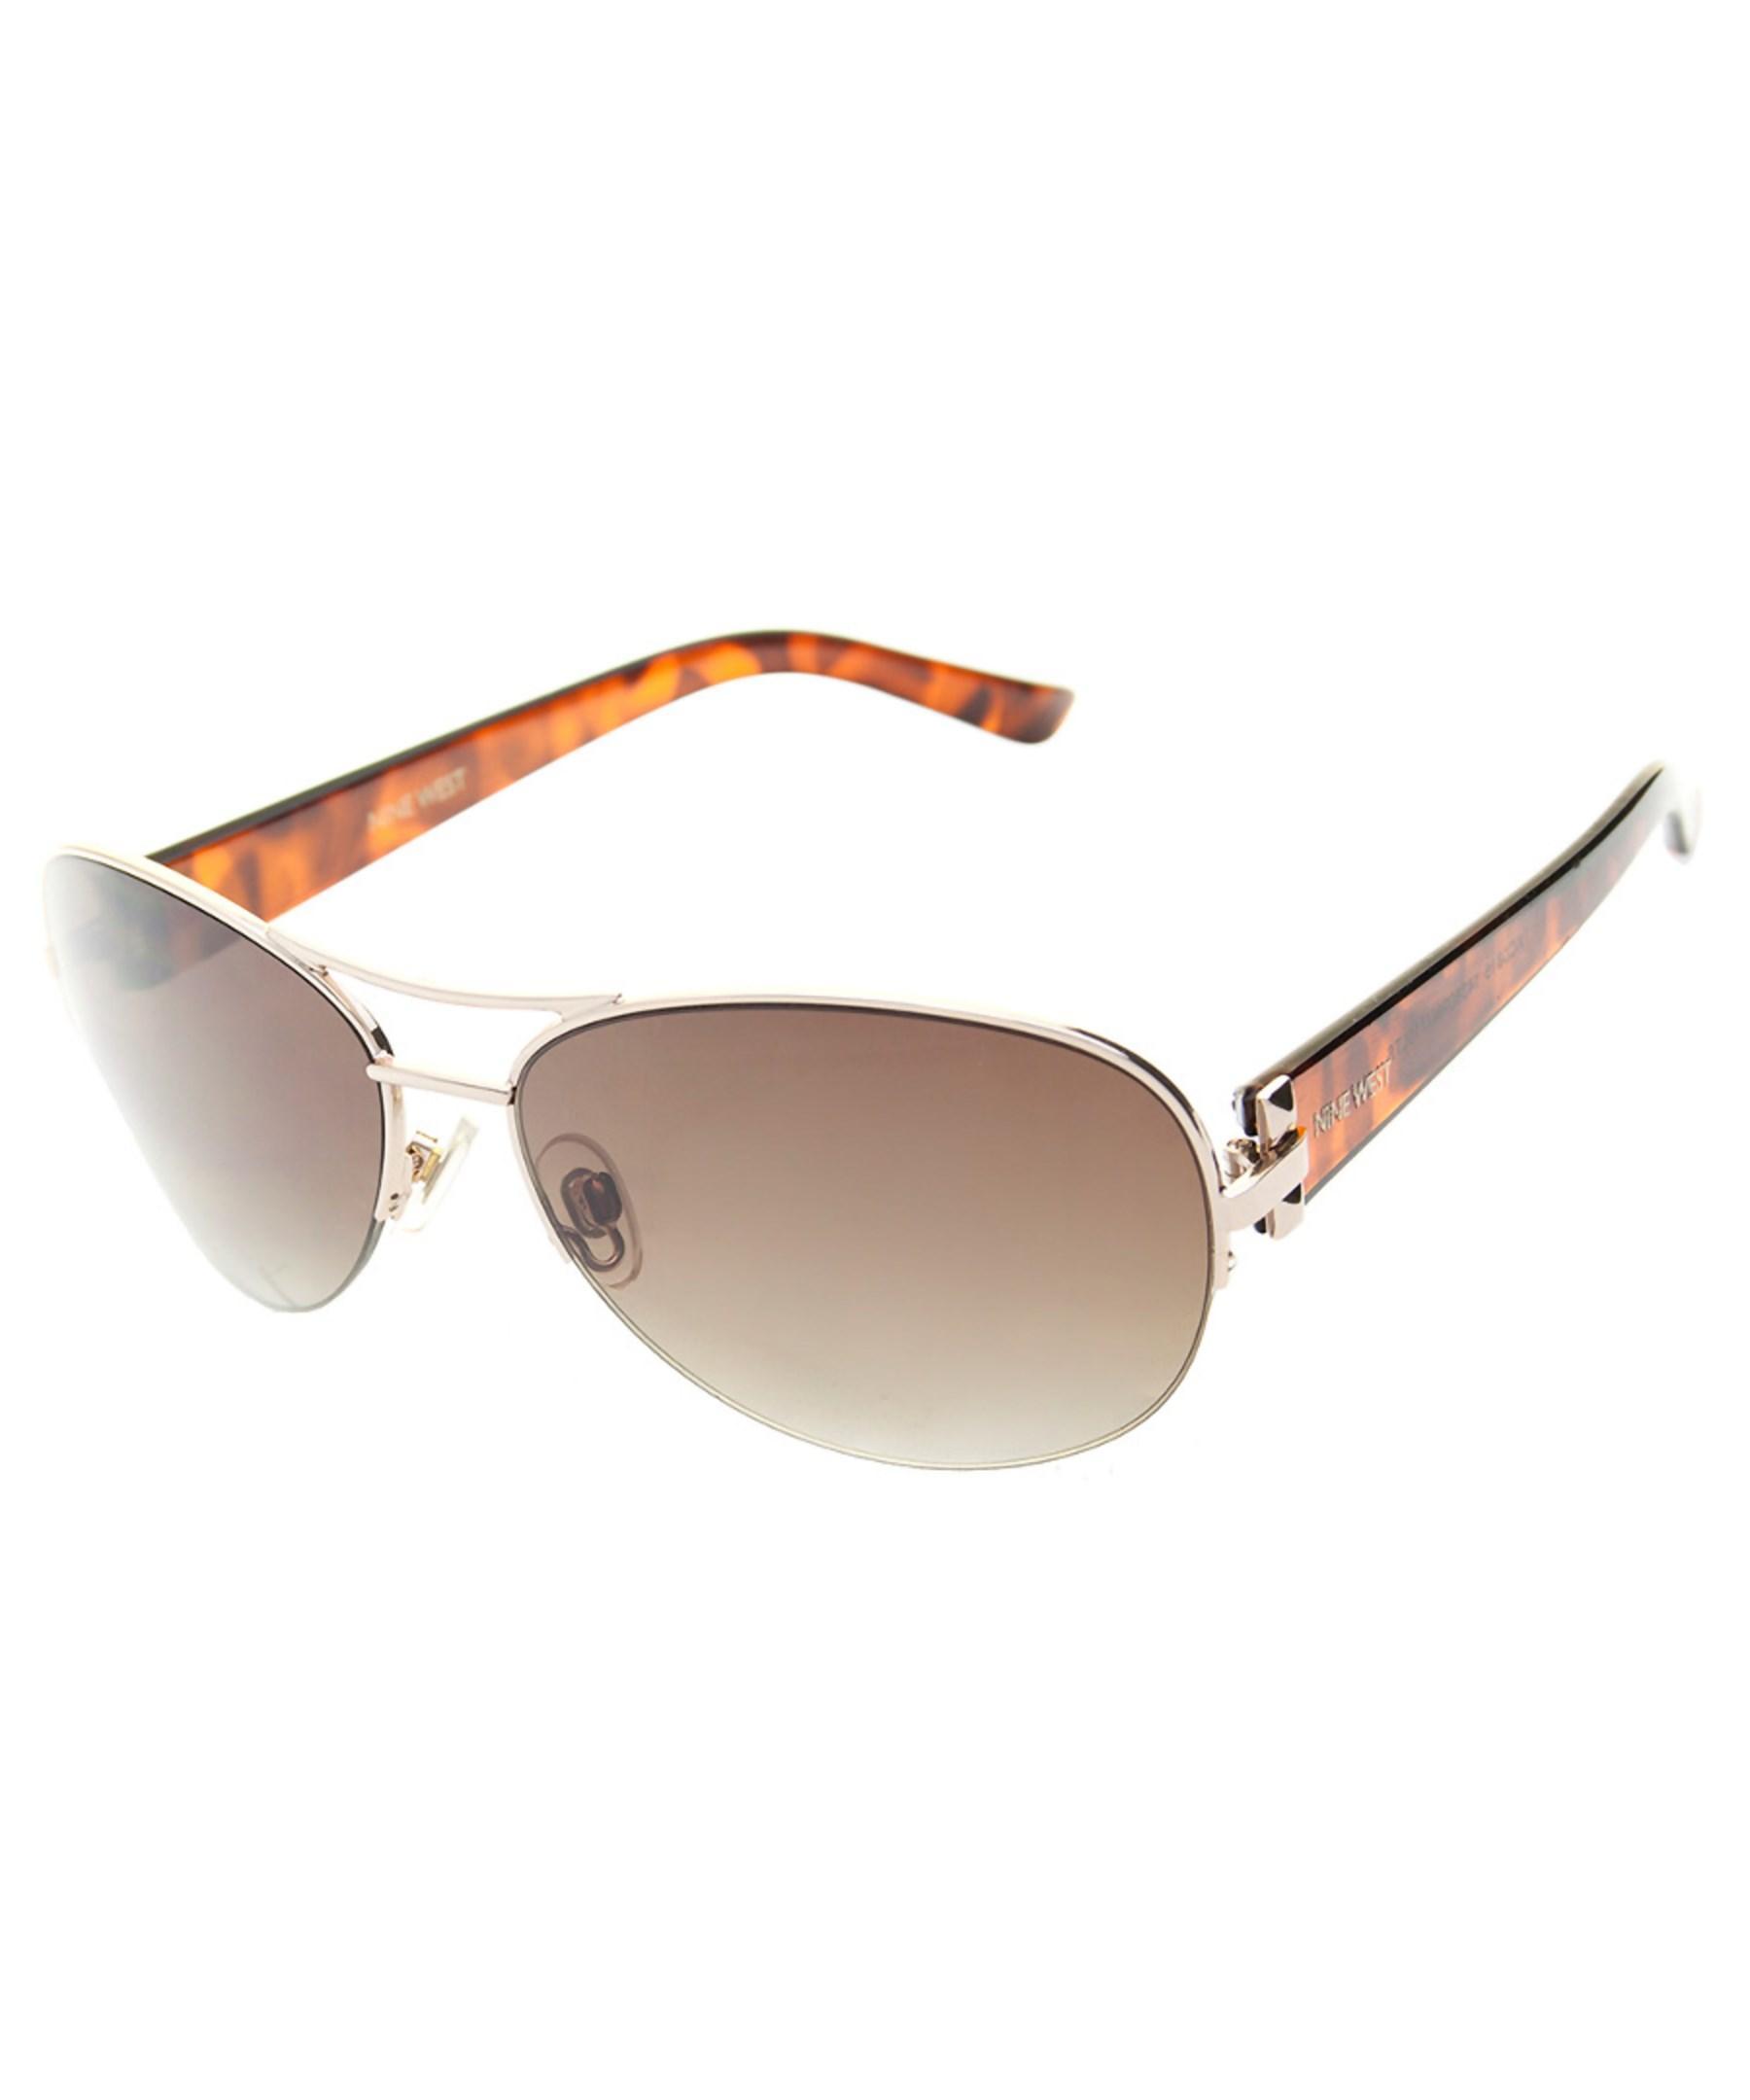 b43e9889cb Lyst - Nine west 14380rnj710 50mm Sunglasses in Brown